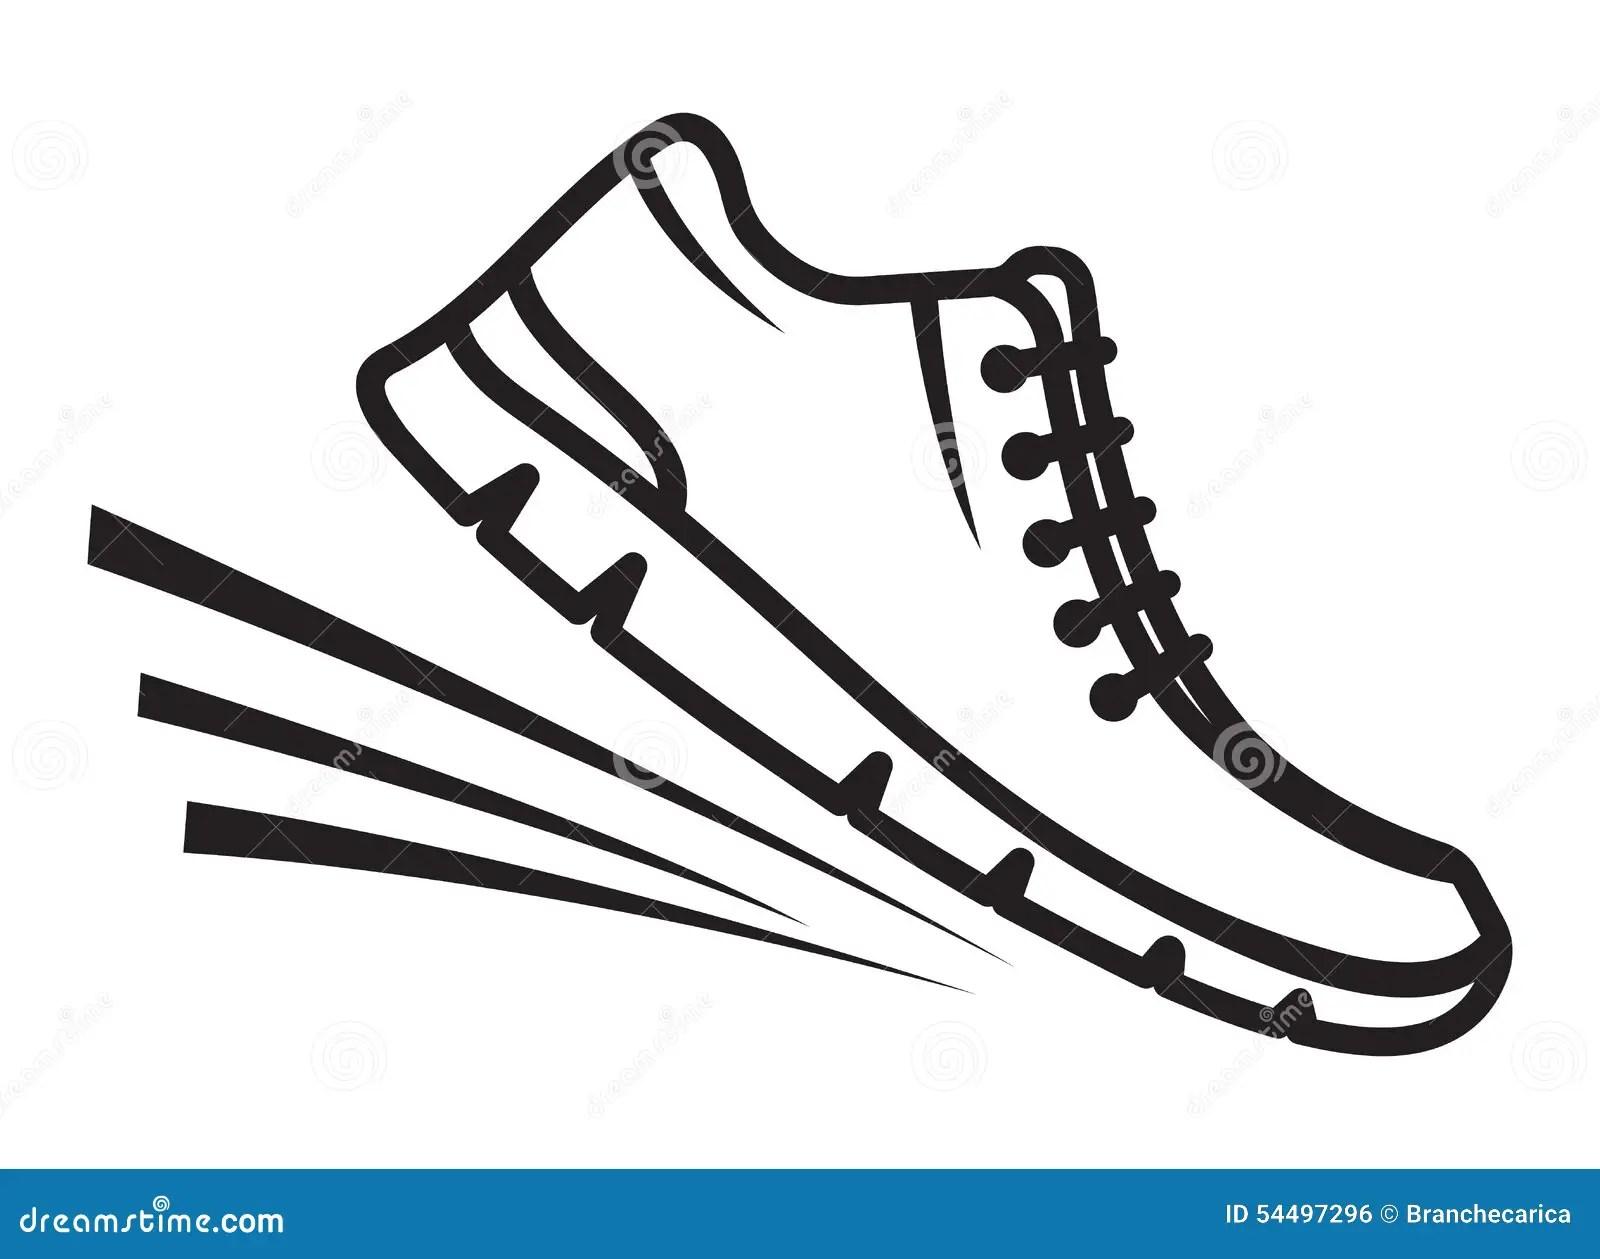 Running Shoes Icon Stock Illustration